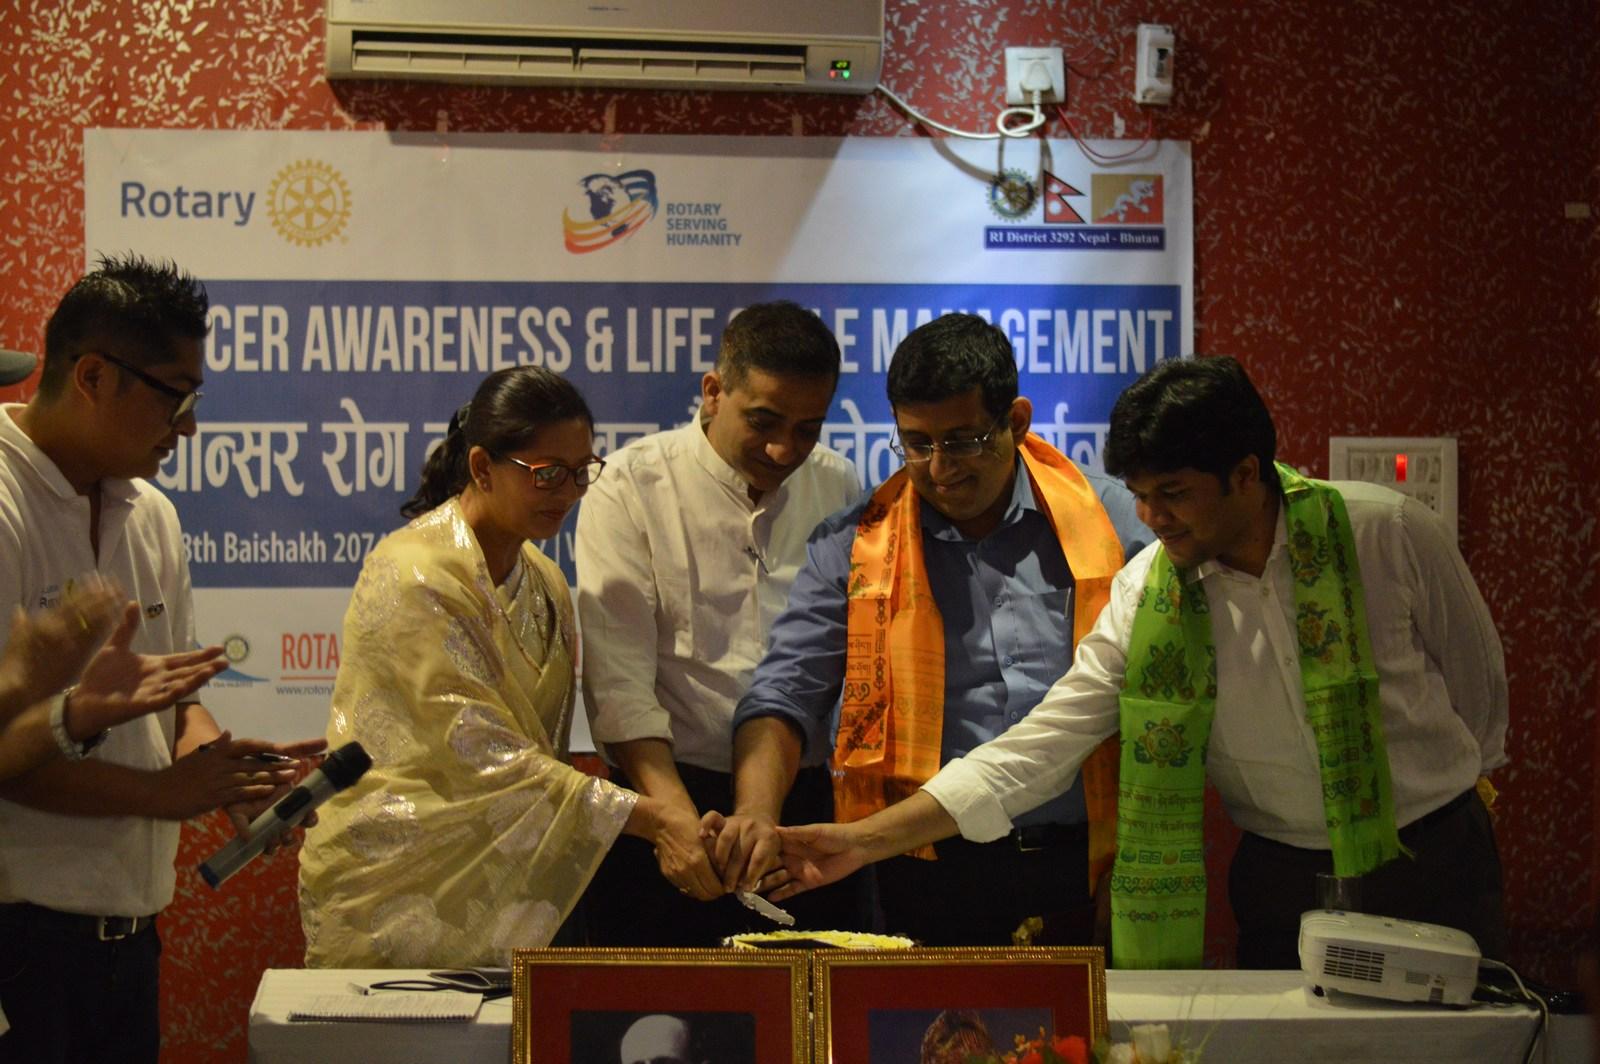 Cancer-Awareness-Life-Style-Management-Interaction-Program-2016-17-Rotary-Club-of-Kakarvitta-105